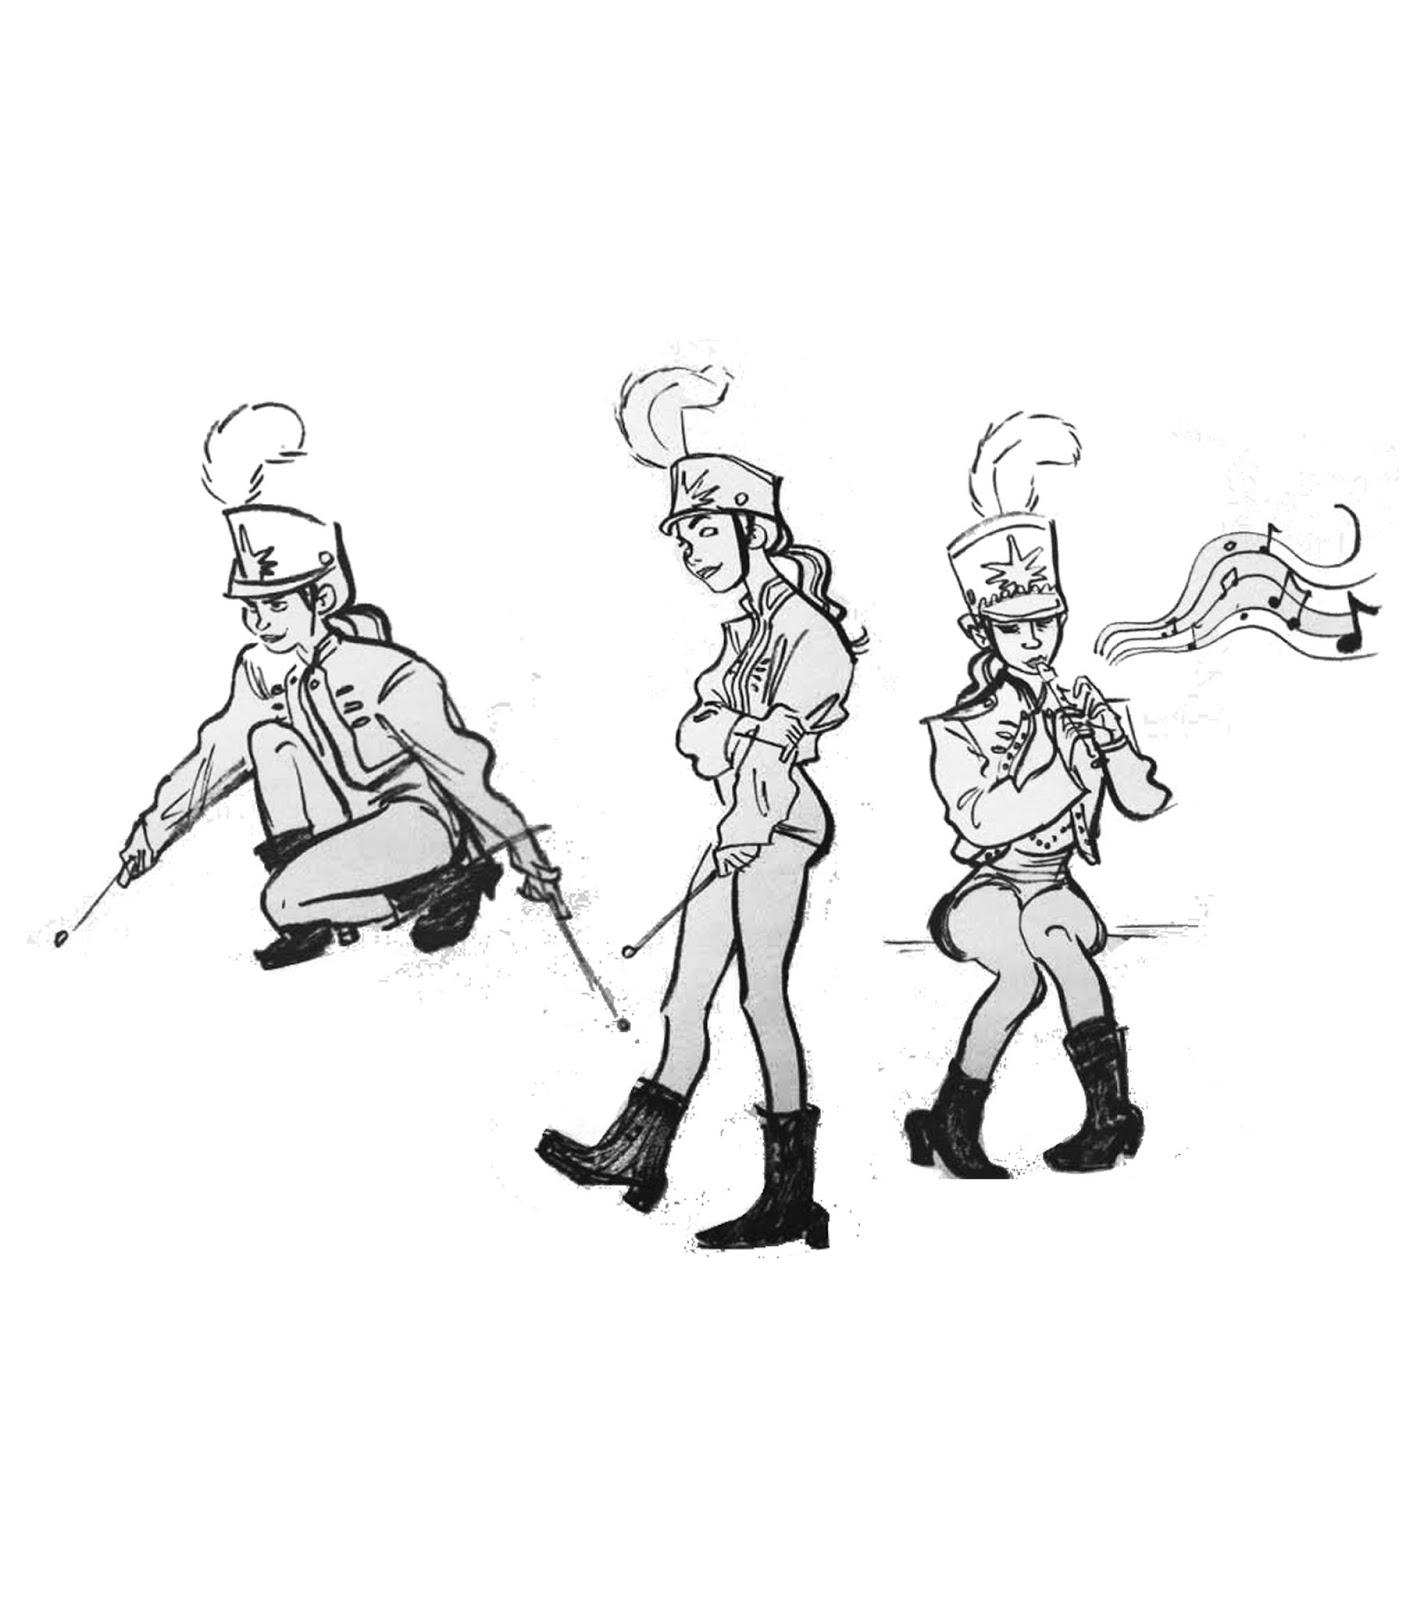 Calarts Character Design Portfolio : Brittany myers art calarts life drawing